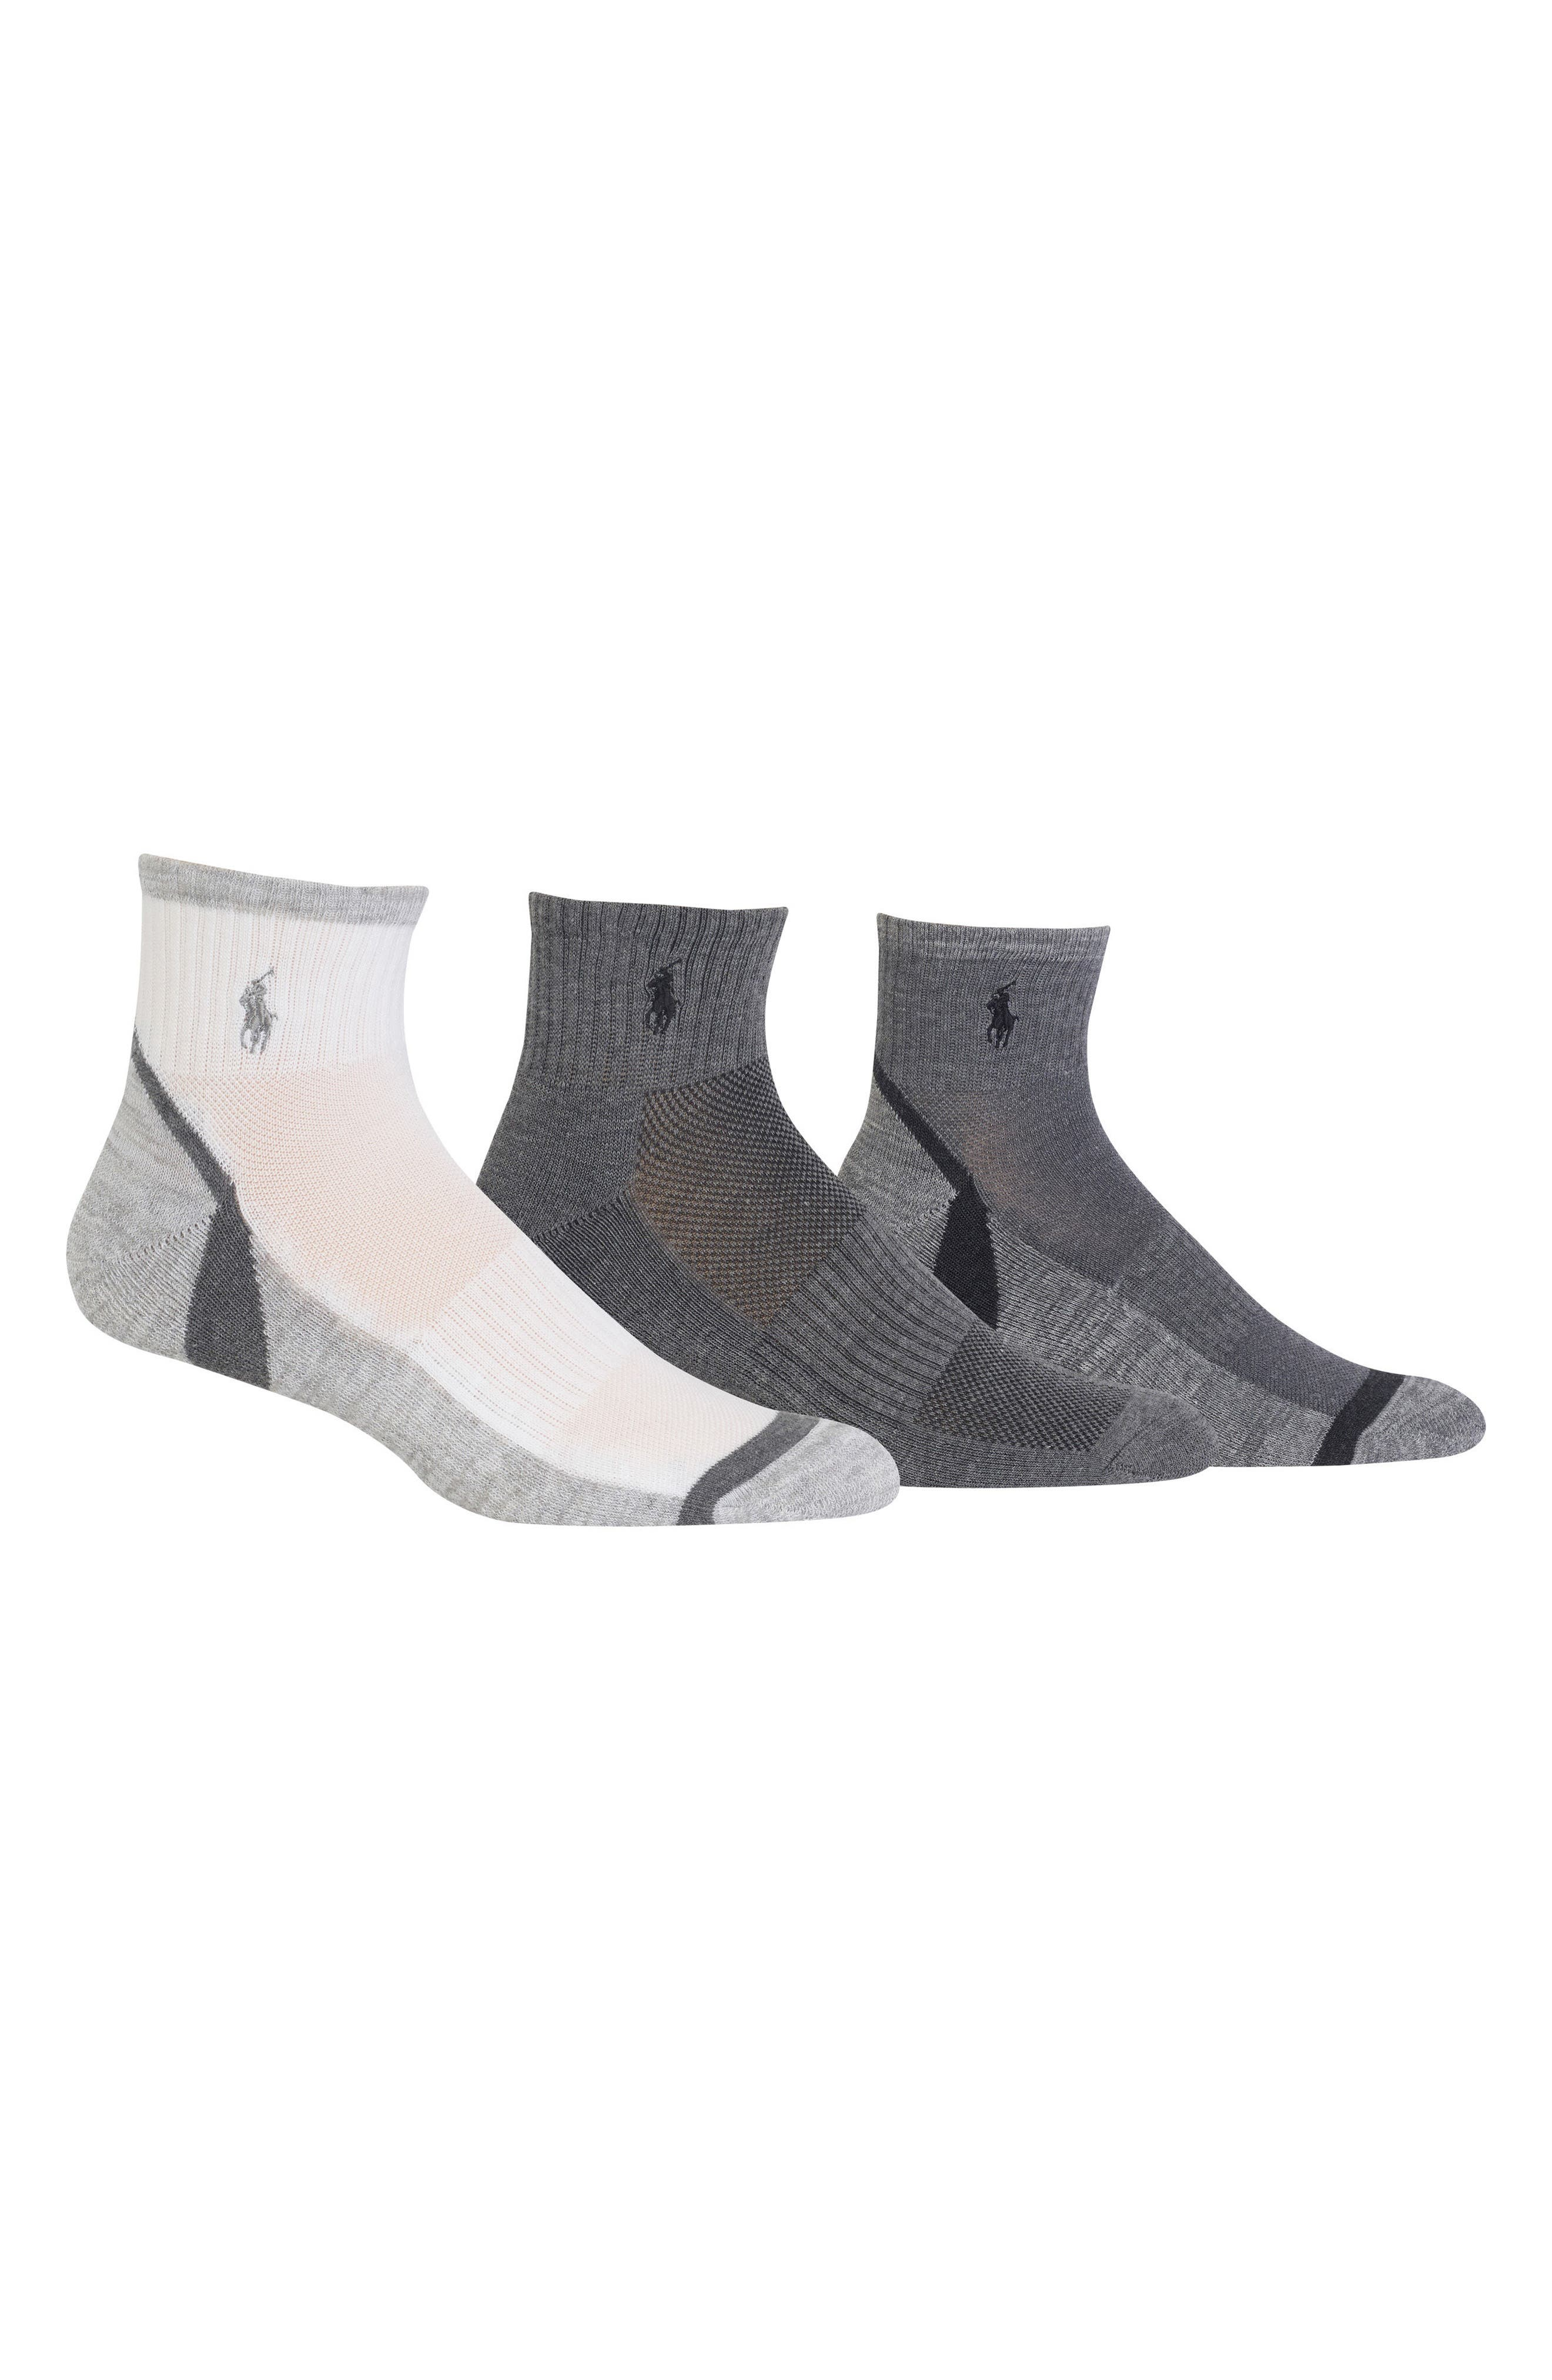 3-Pack Athletic Socks,                             Main thumbnail 1, color,